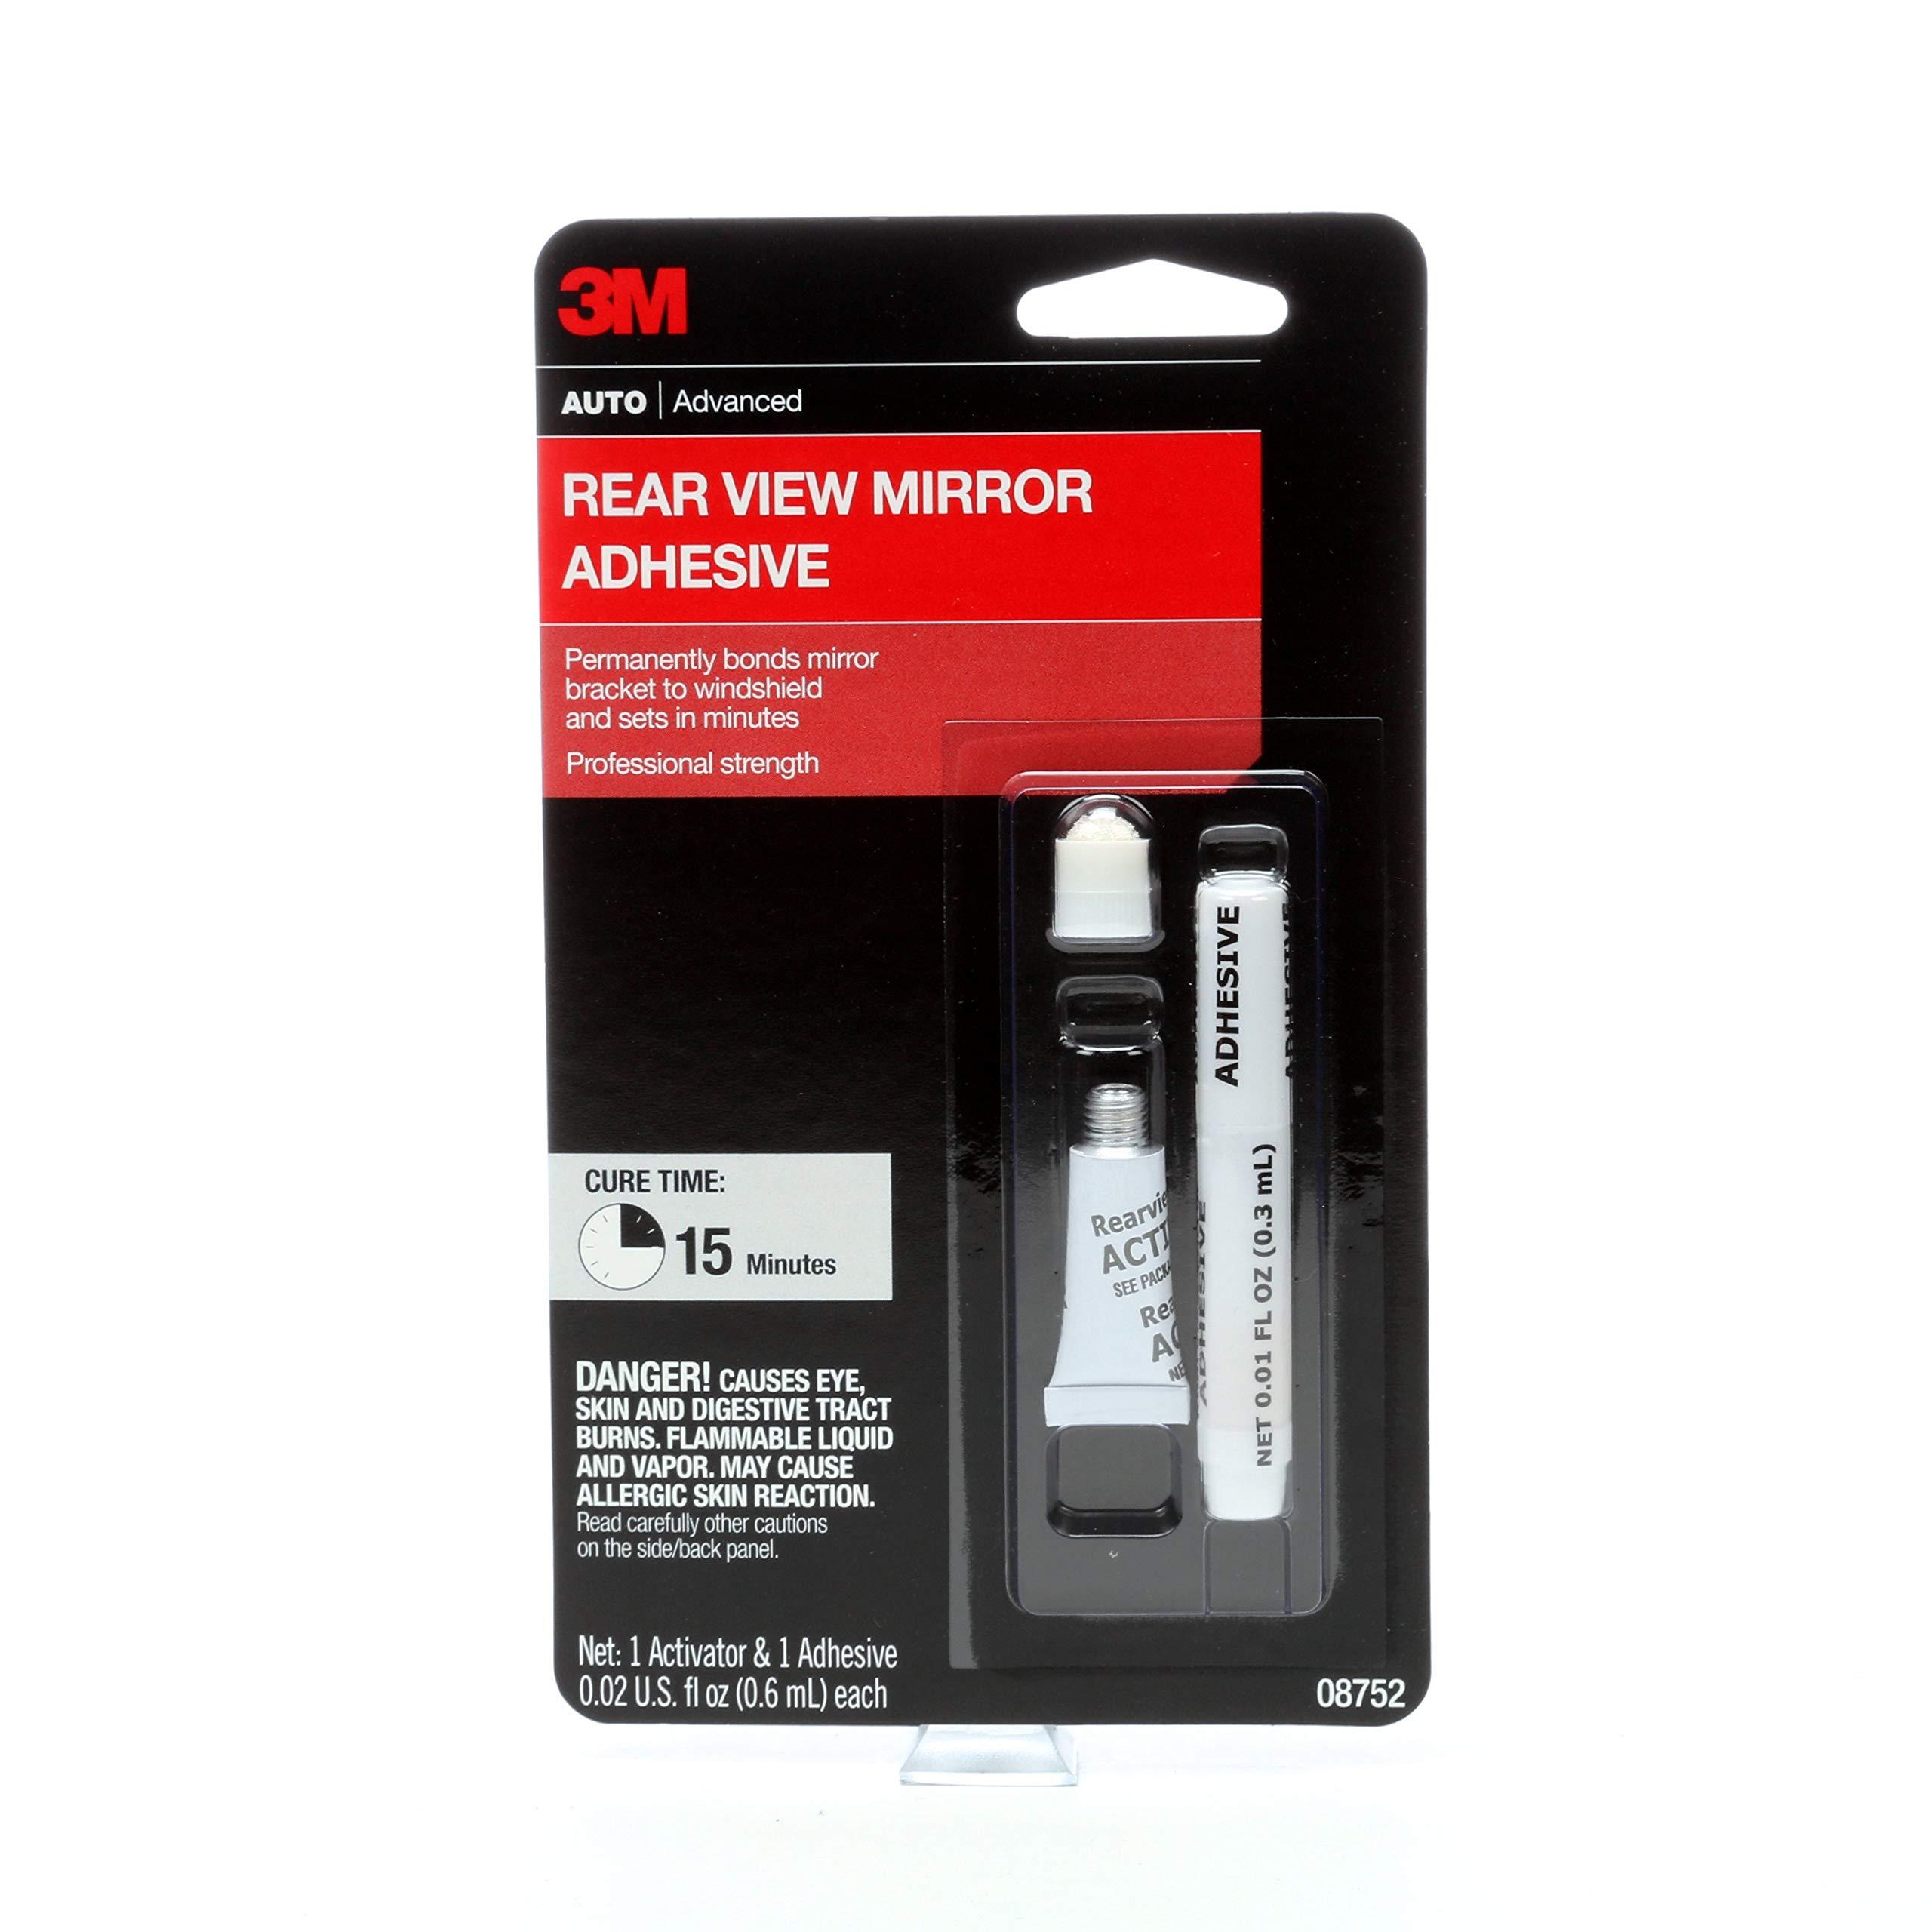 3M Rearview Mirror Adhesive, 08752, 0.02 fl oz